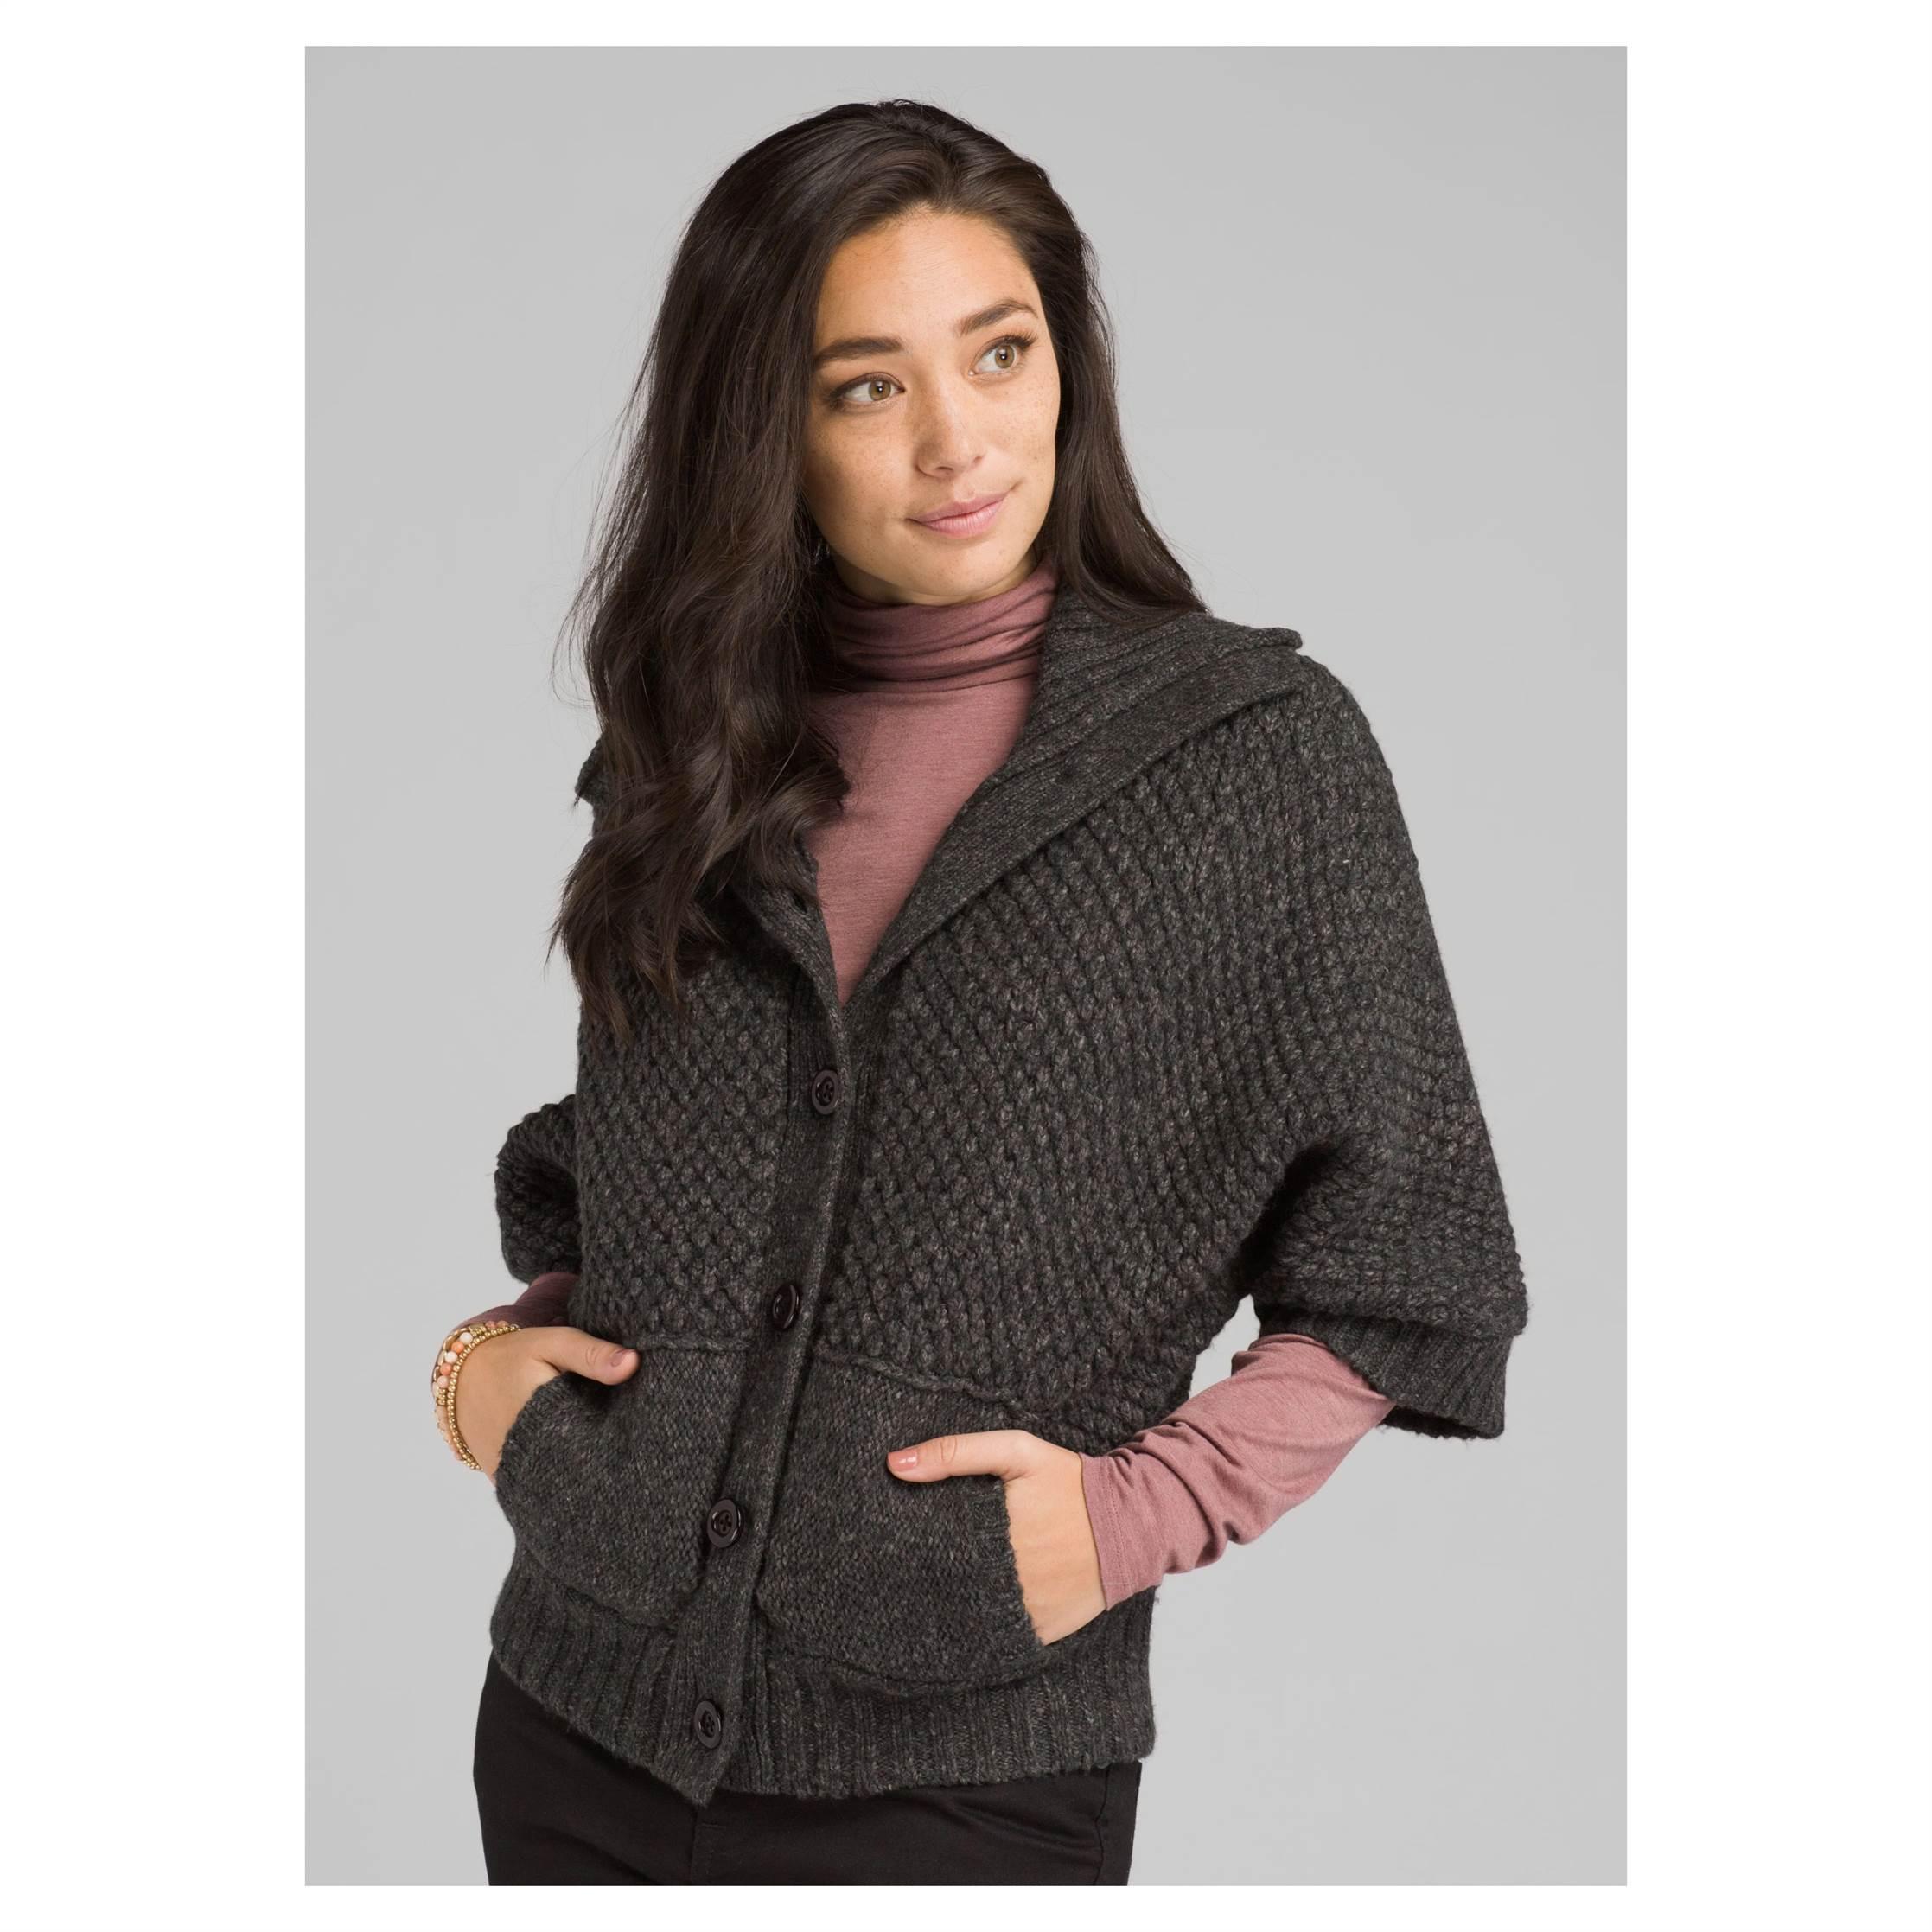 Milone Sweater - Women's